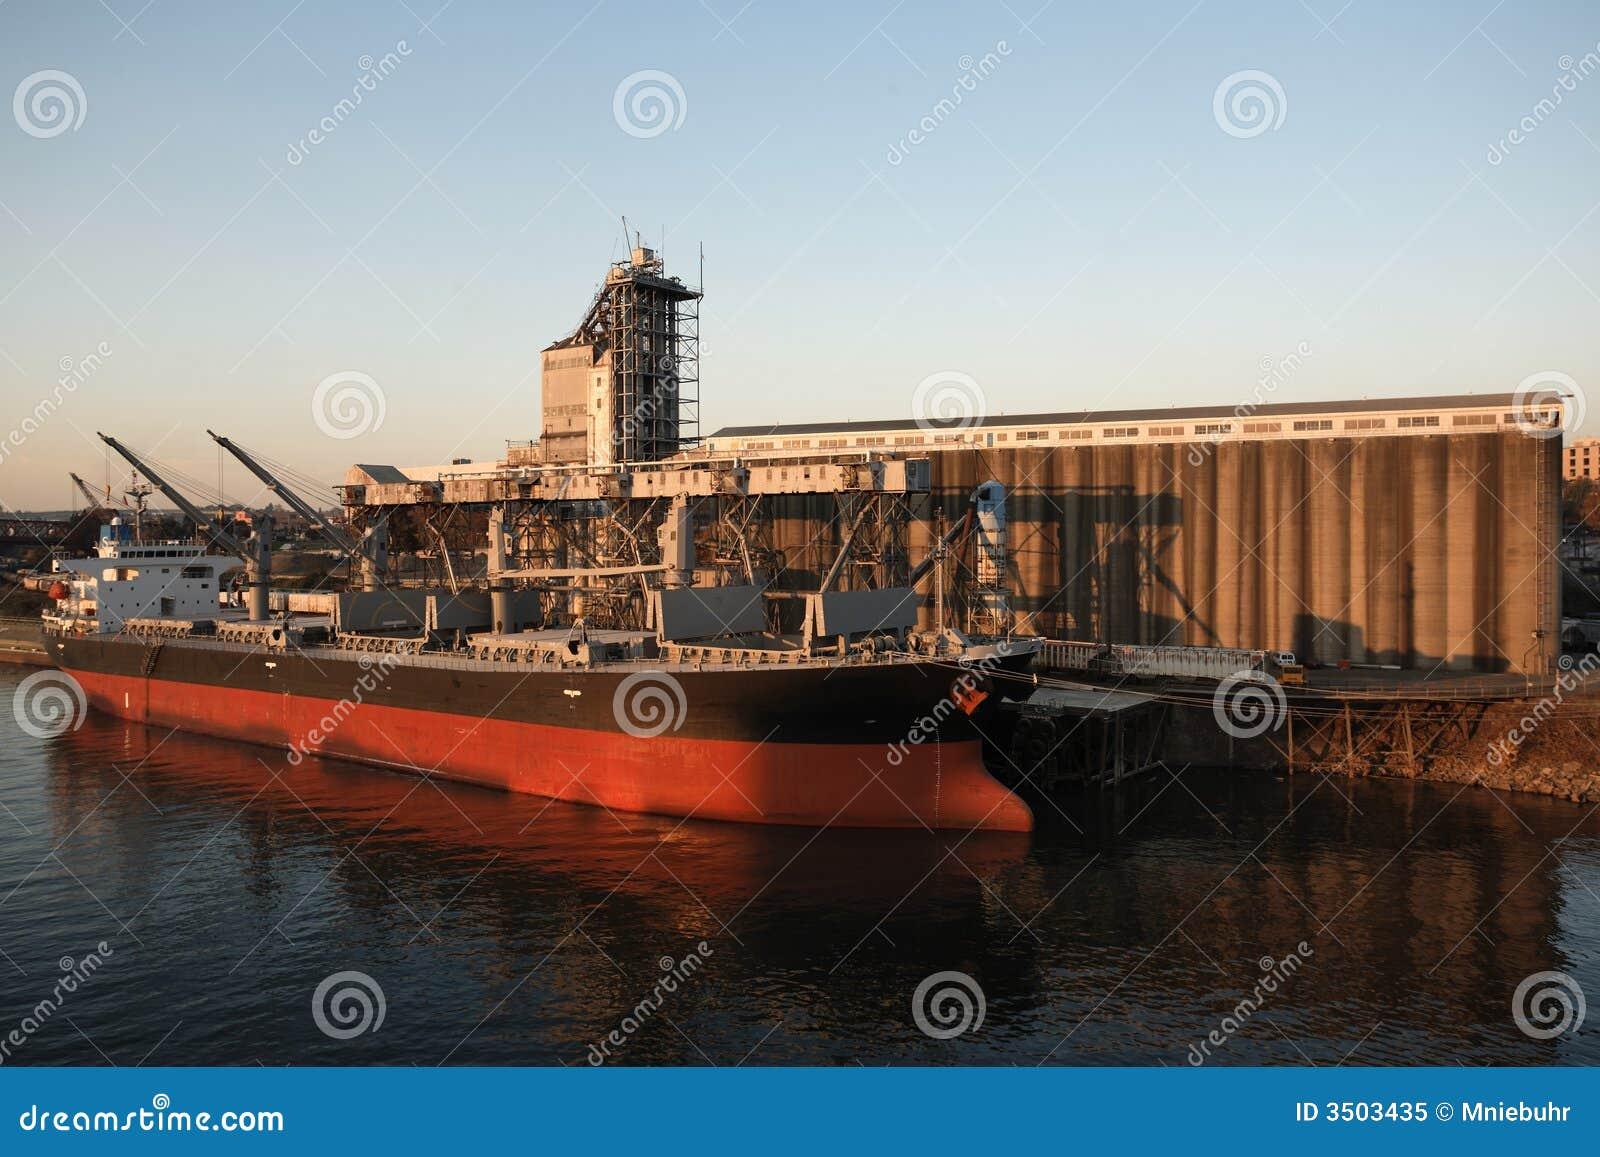 Industrial Ship In The Tyrrhenian Sea Stock Photography ...